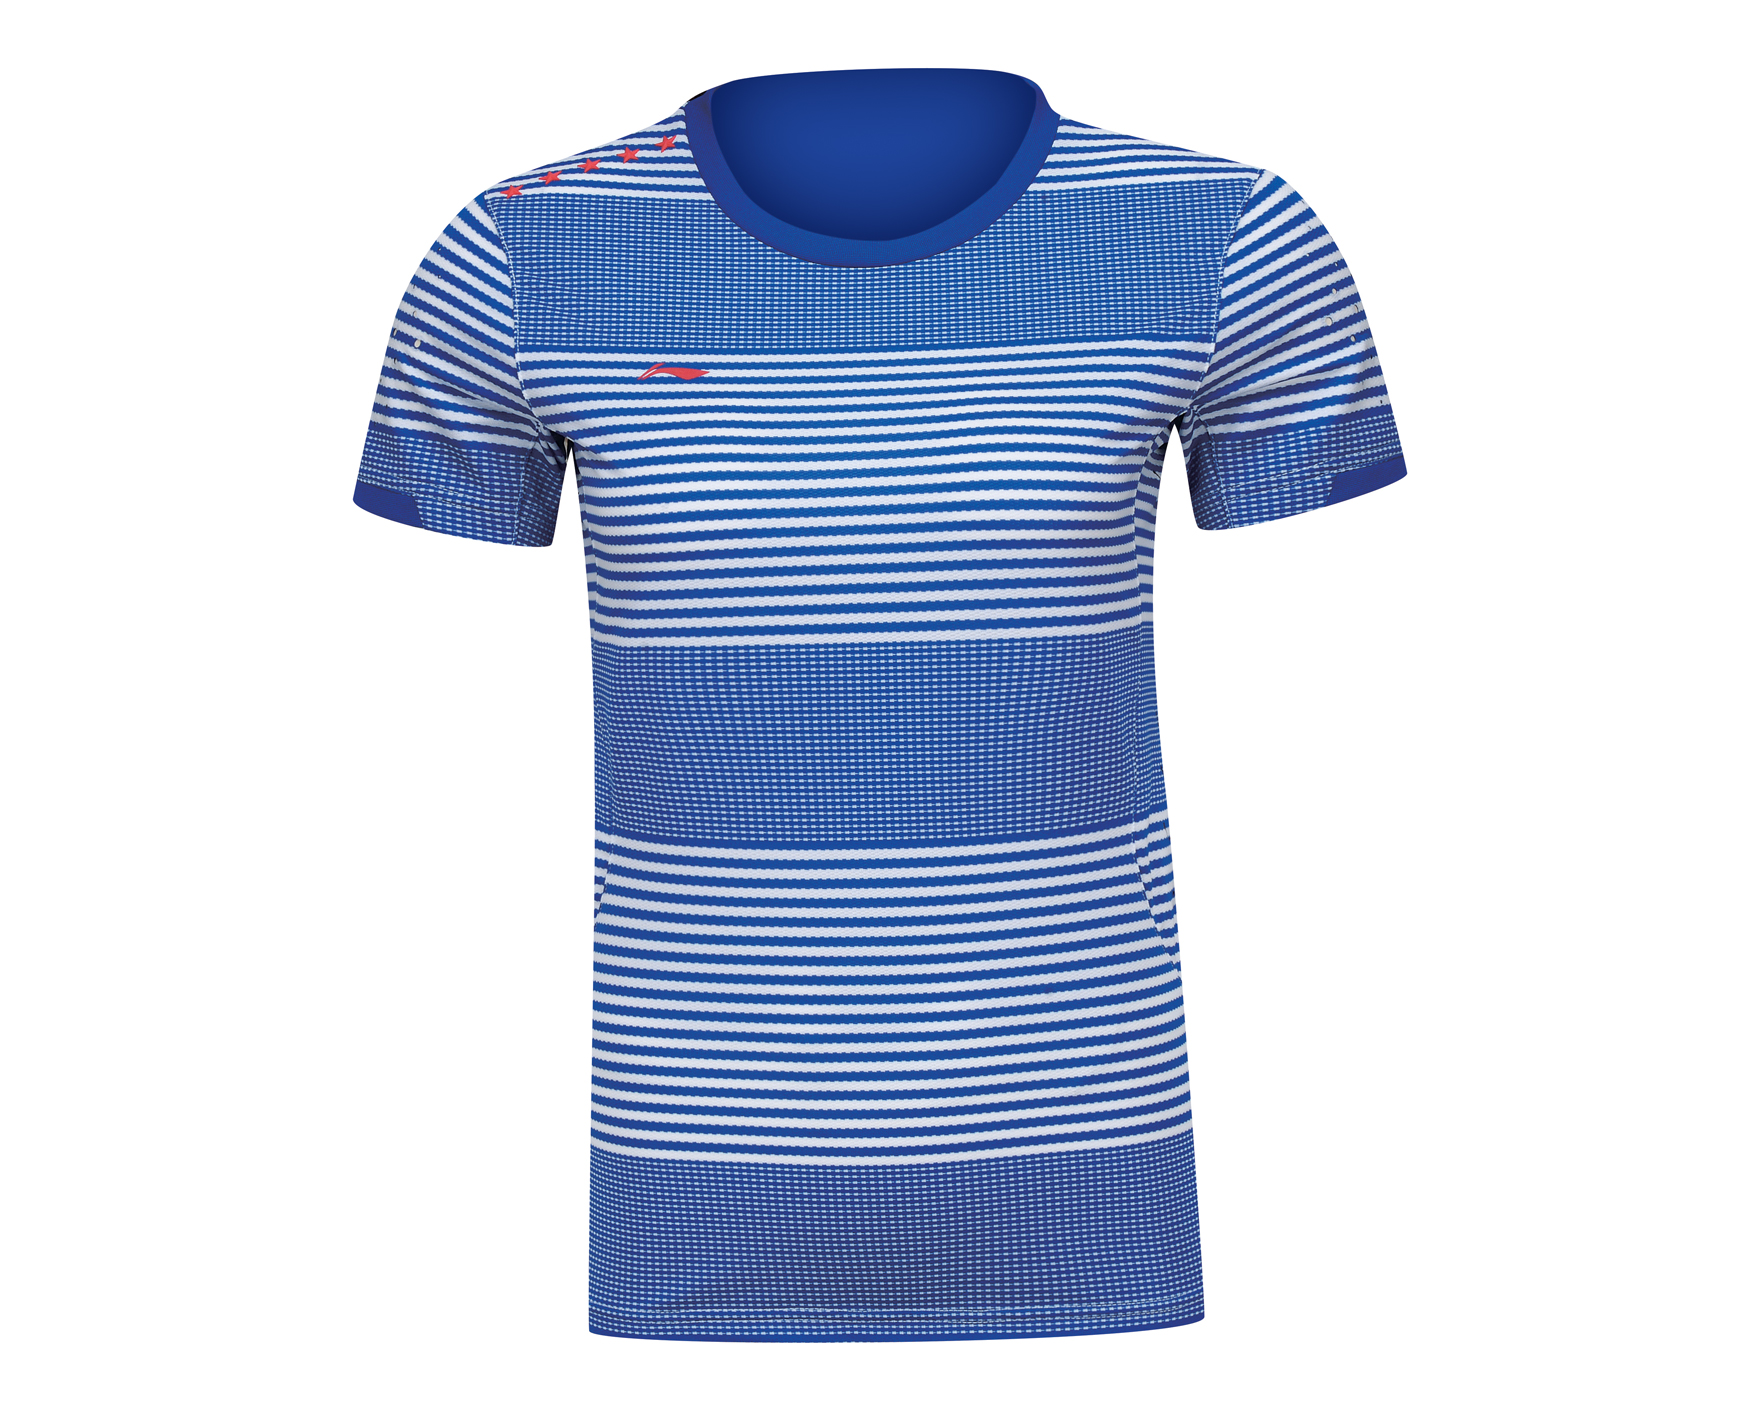 Badminton clothing online